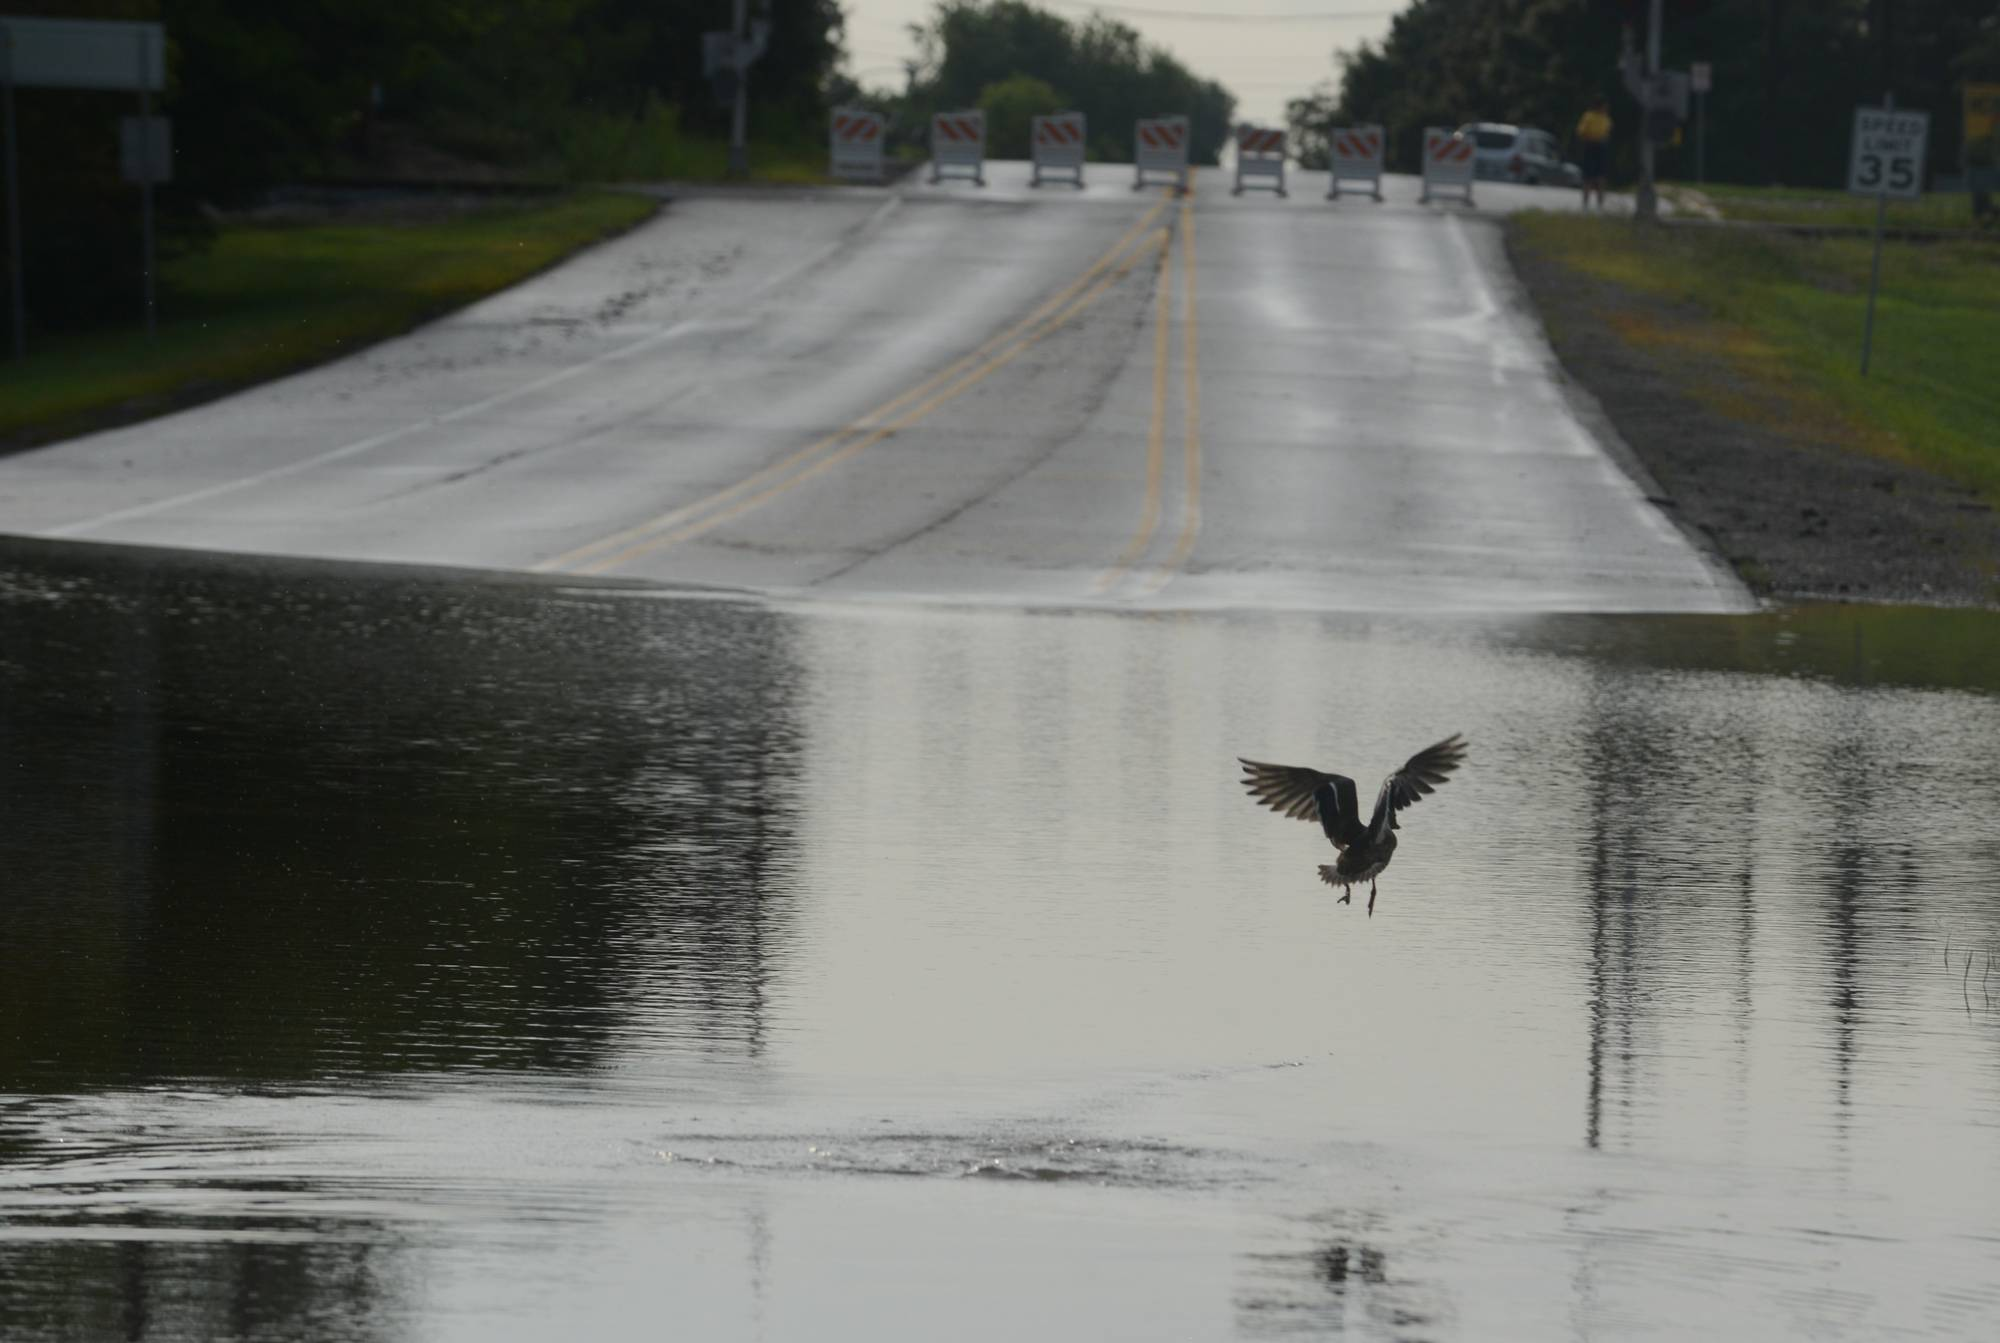 Heavy overnight rains close roads across suburbs